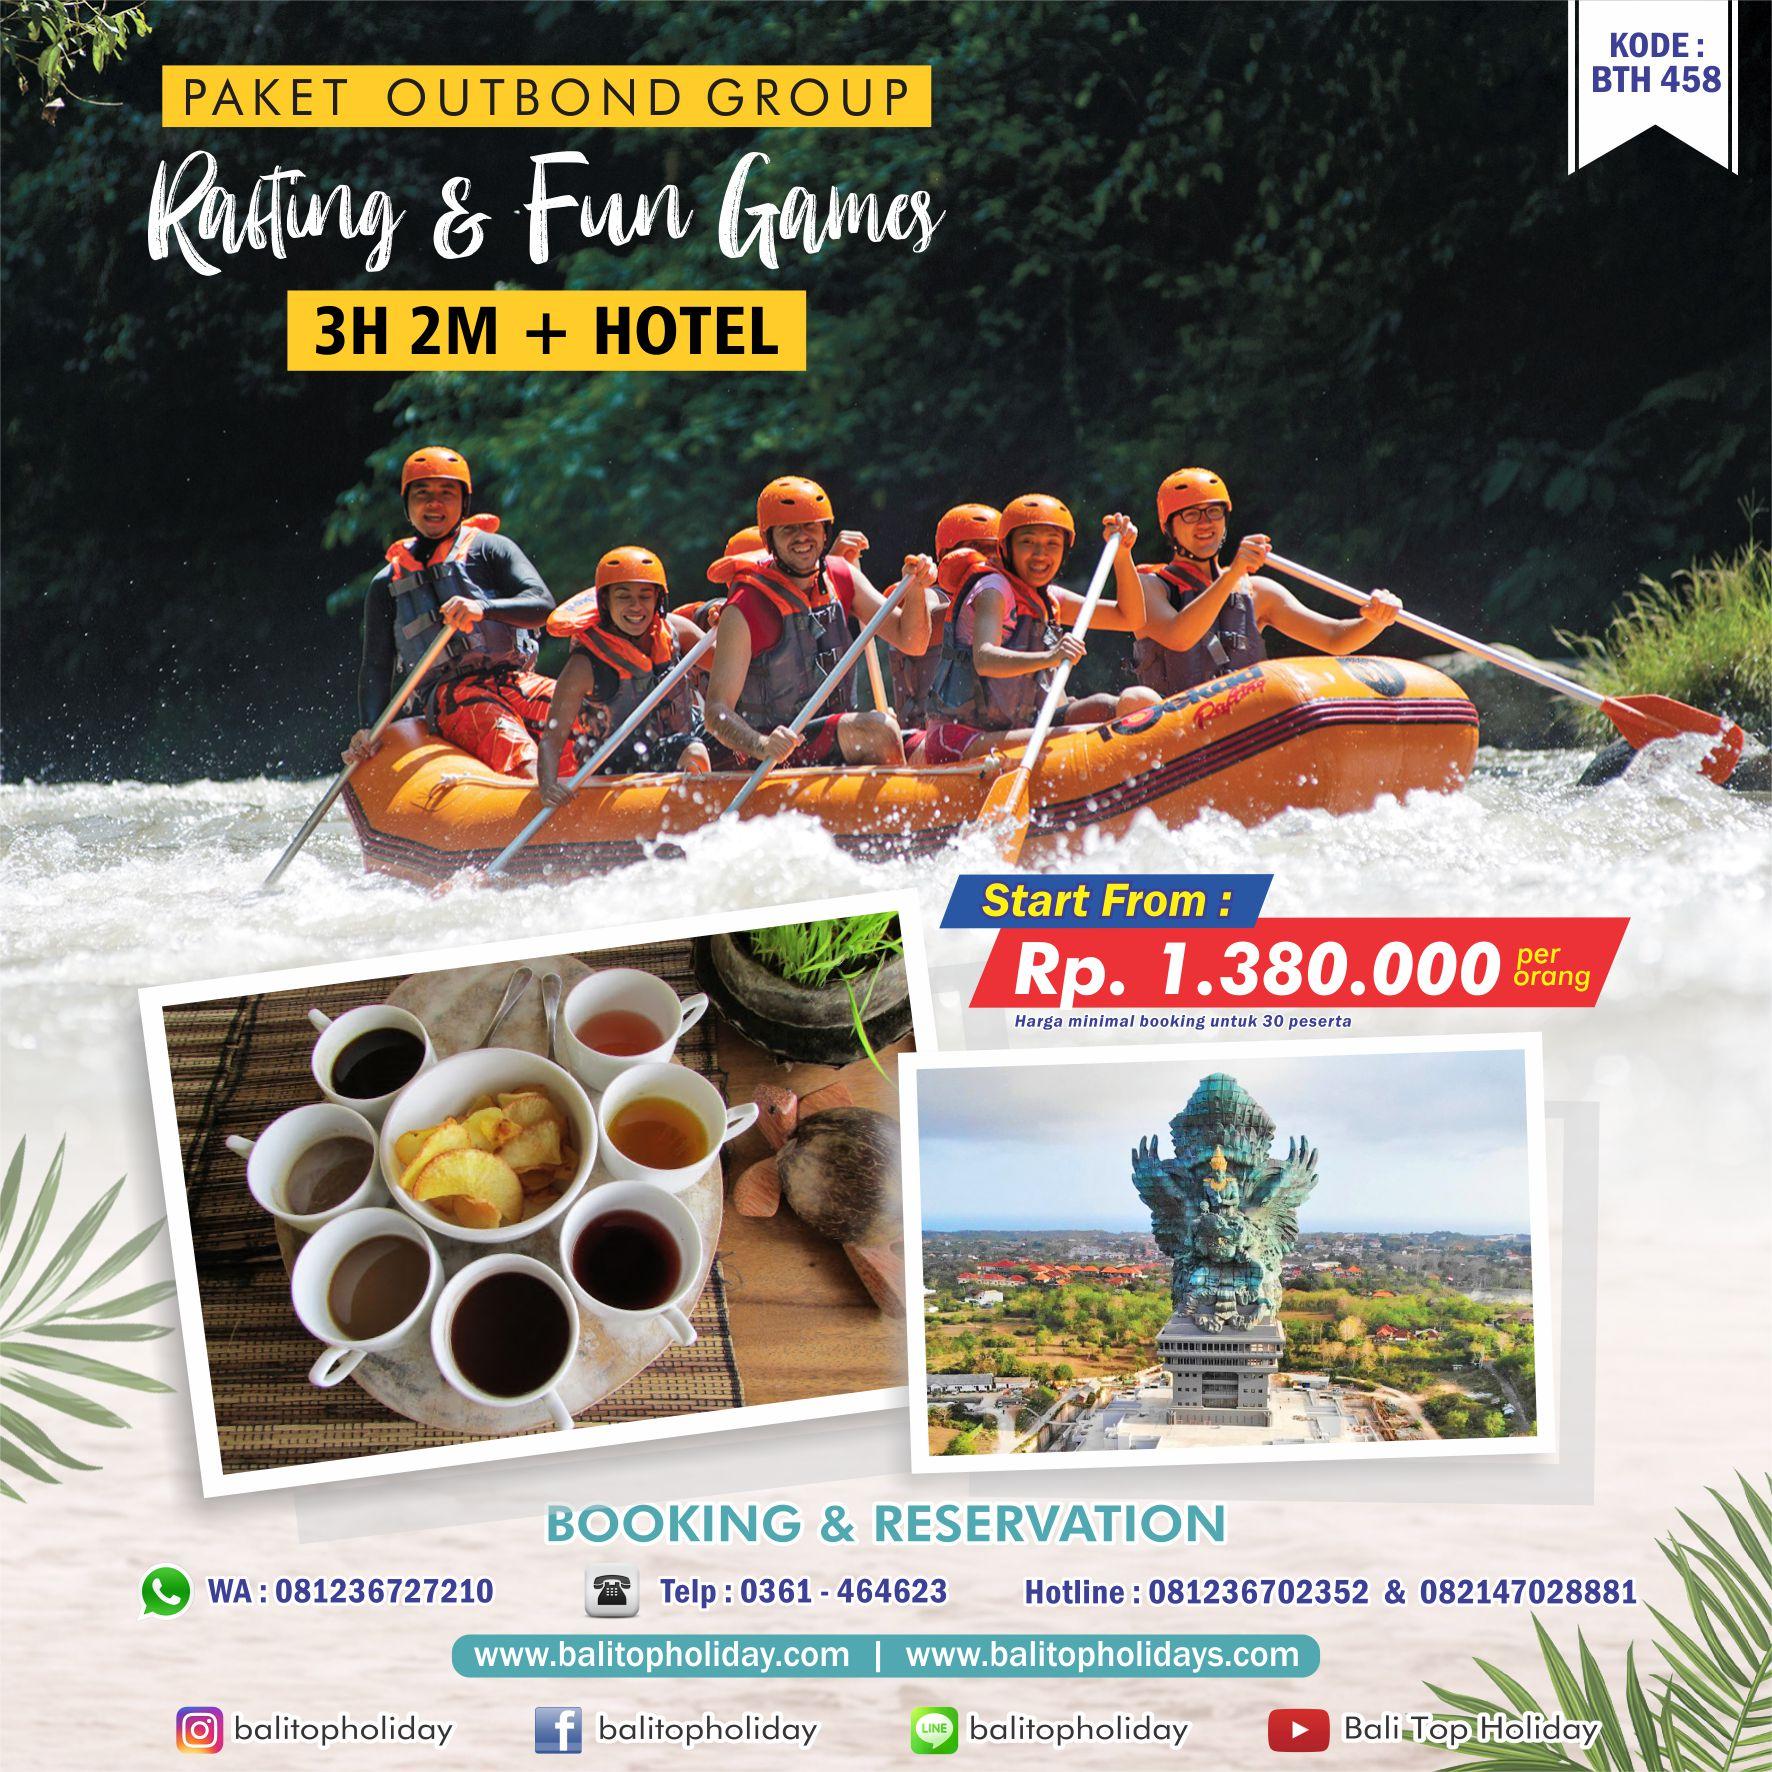 Paket Outbound Bali 3 Hari 2 Malam (Rafting & Fun Games)